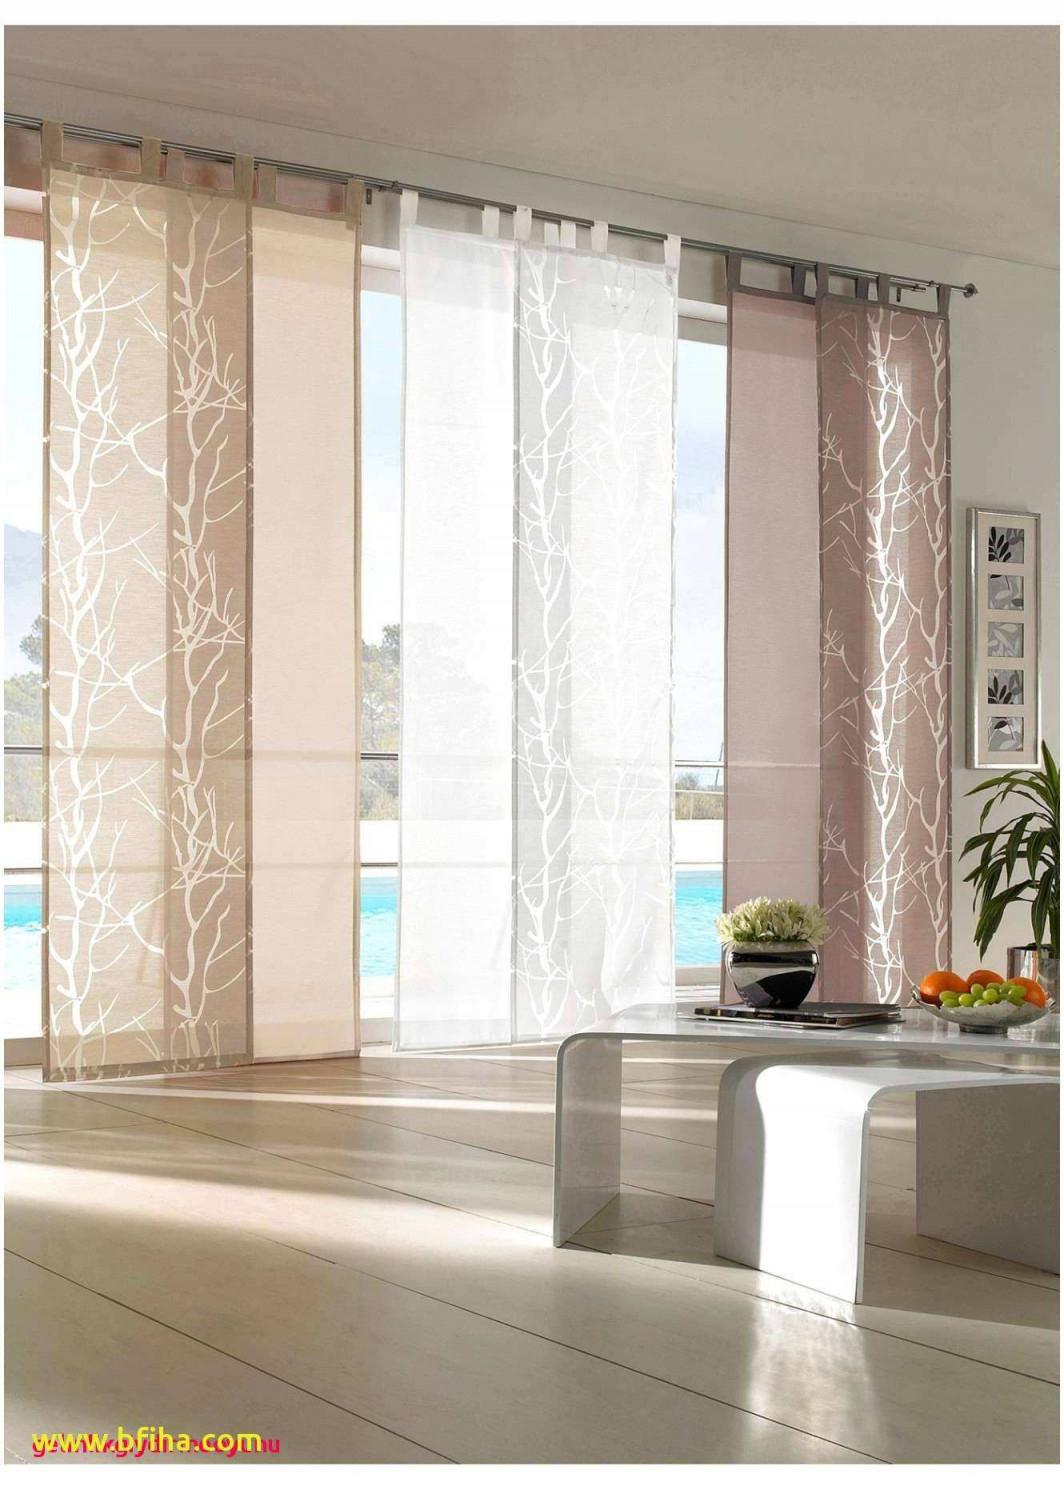 59 Neu Gardinen Wohnzimmer Ikea Elegant  Tolles Wohnzimmer von Wohnzimmer Gardinen Elegant Photo